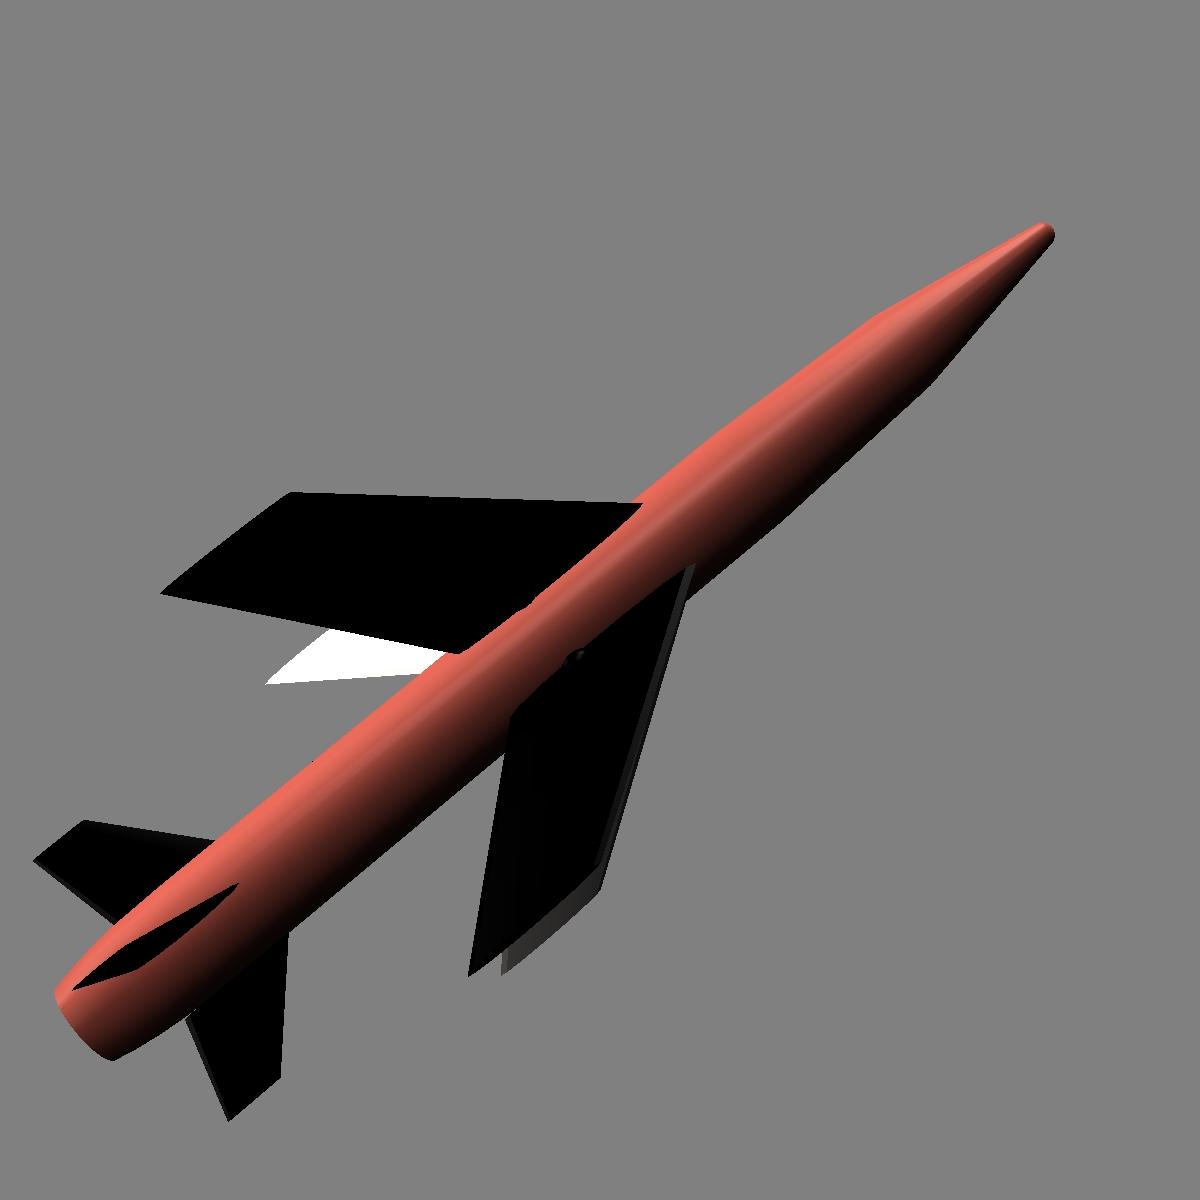 us mgm-18a raketa za lakros 3d model 3ds dxf cob x drugi obj 136523